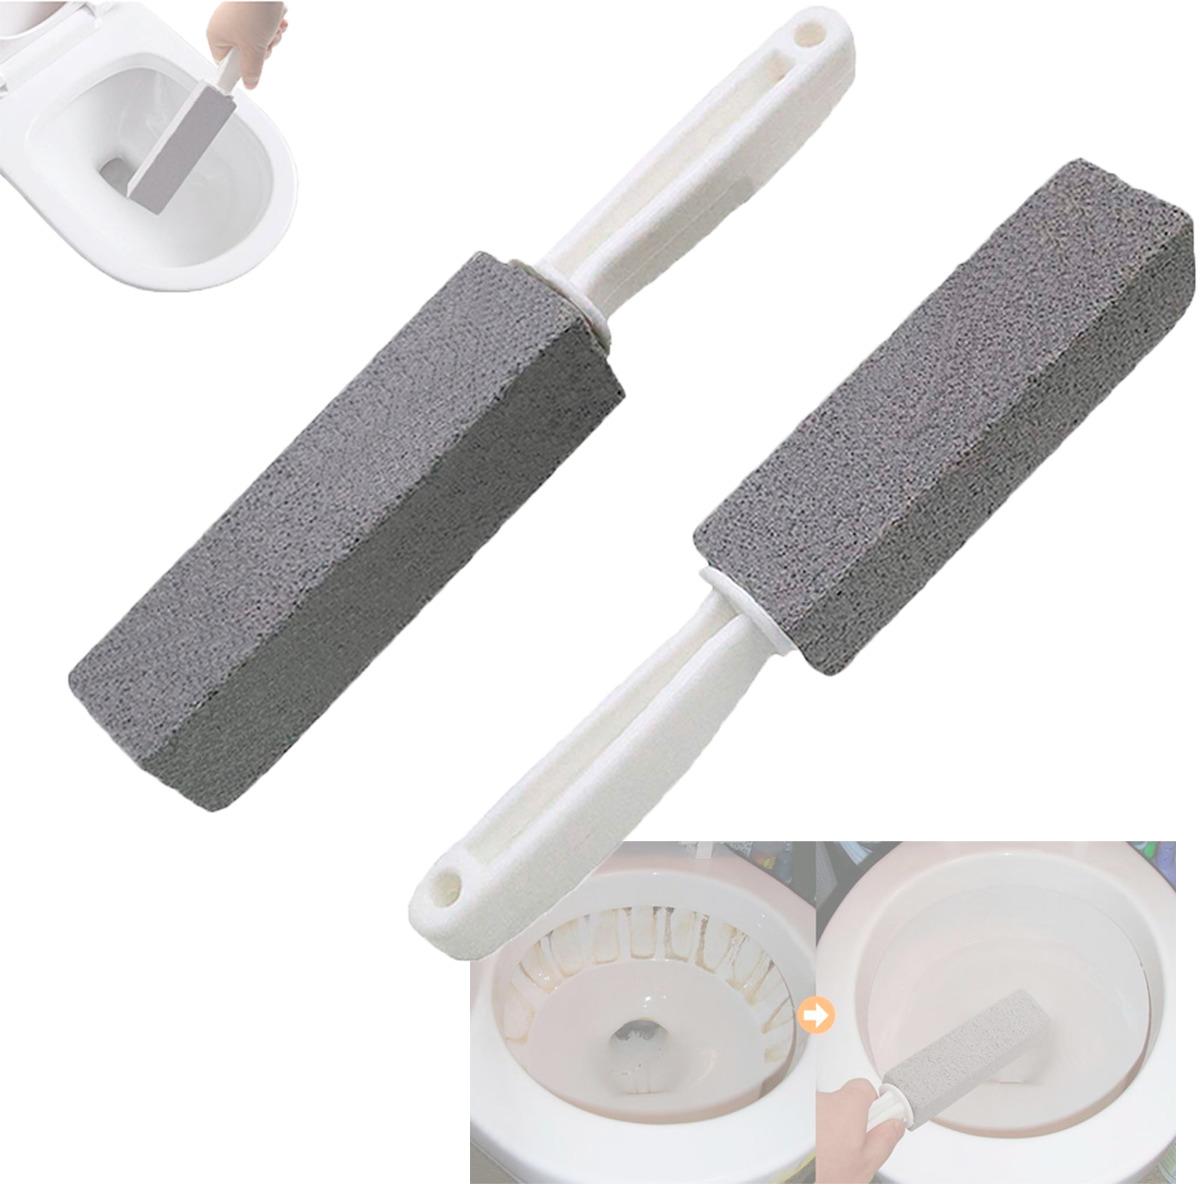 Pumice Stone Toilet Cleaner Barra Limpiadora De Sarro